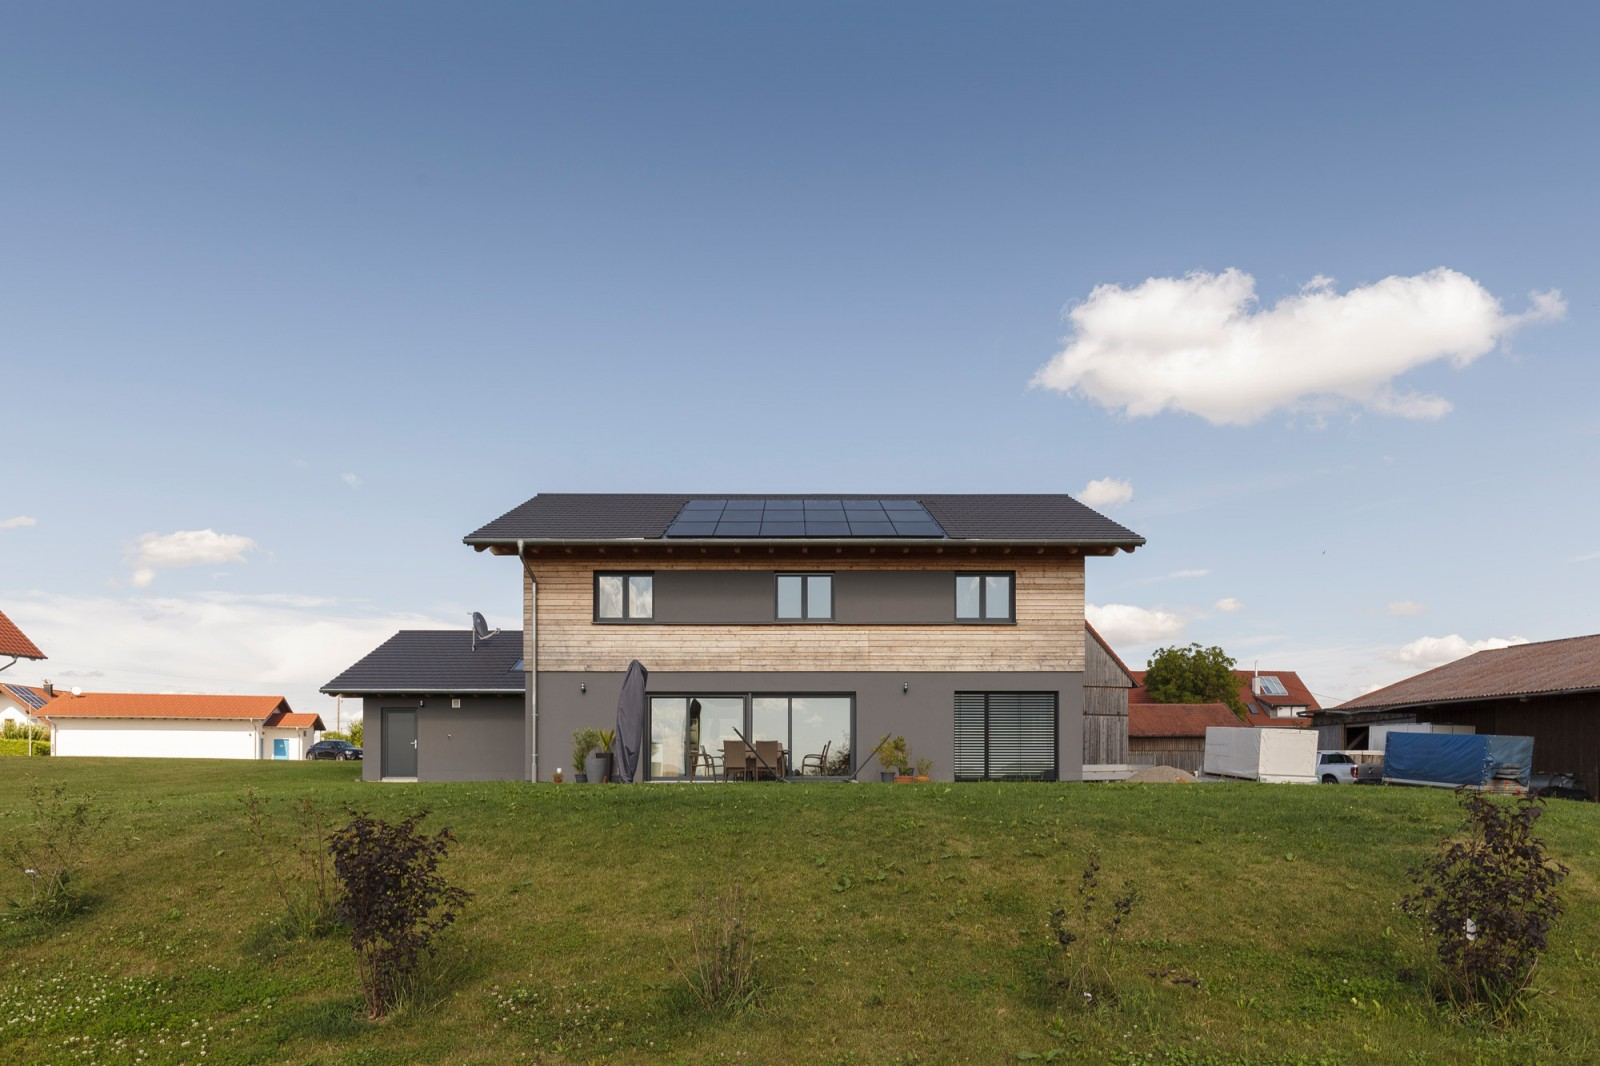 Haus aus Massiv-Holz-Mauer